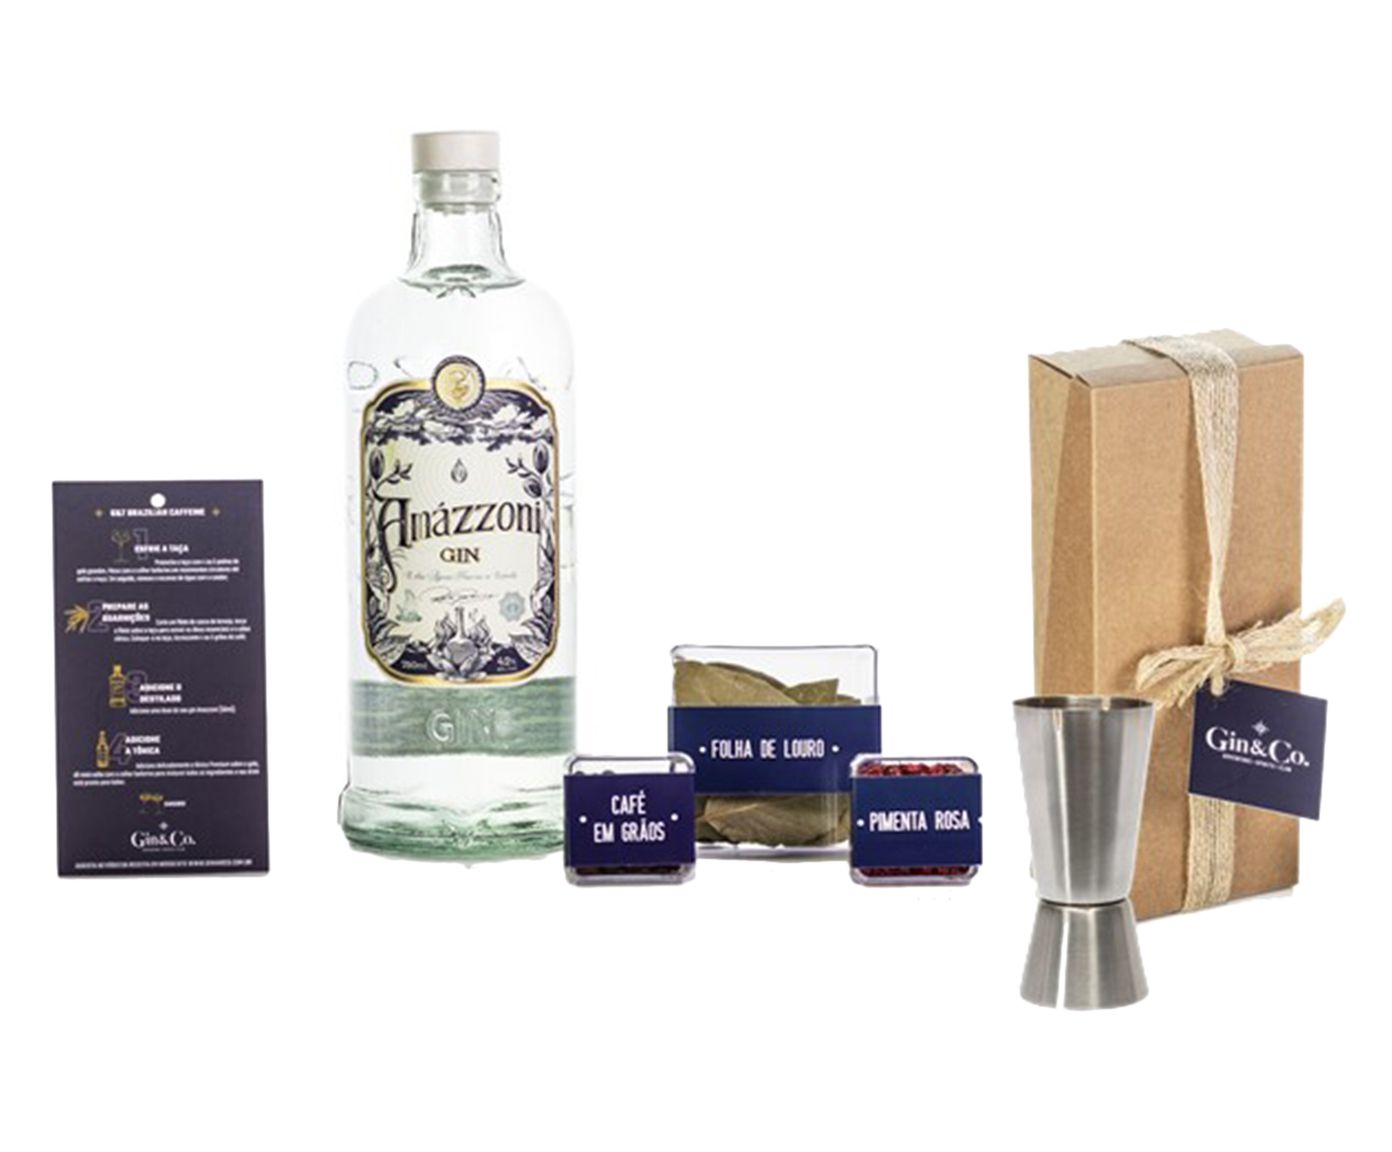 Jogo para Preparo em Inox de Gin Amazzoni Gin | Westwing.com.br